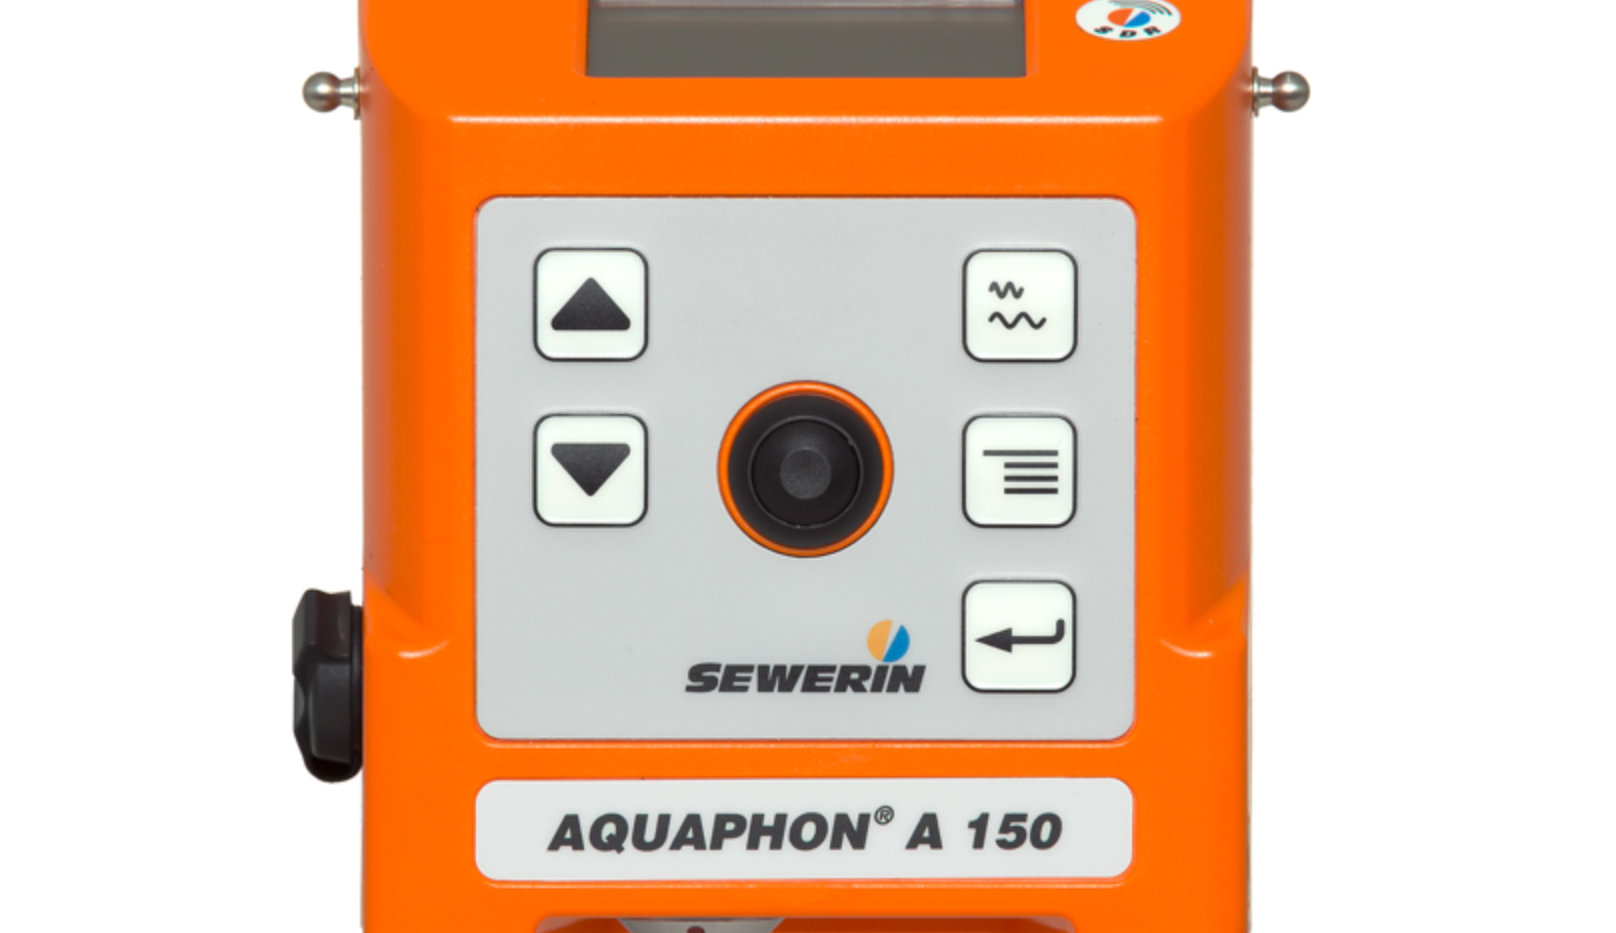 Aquaphon A 150